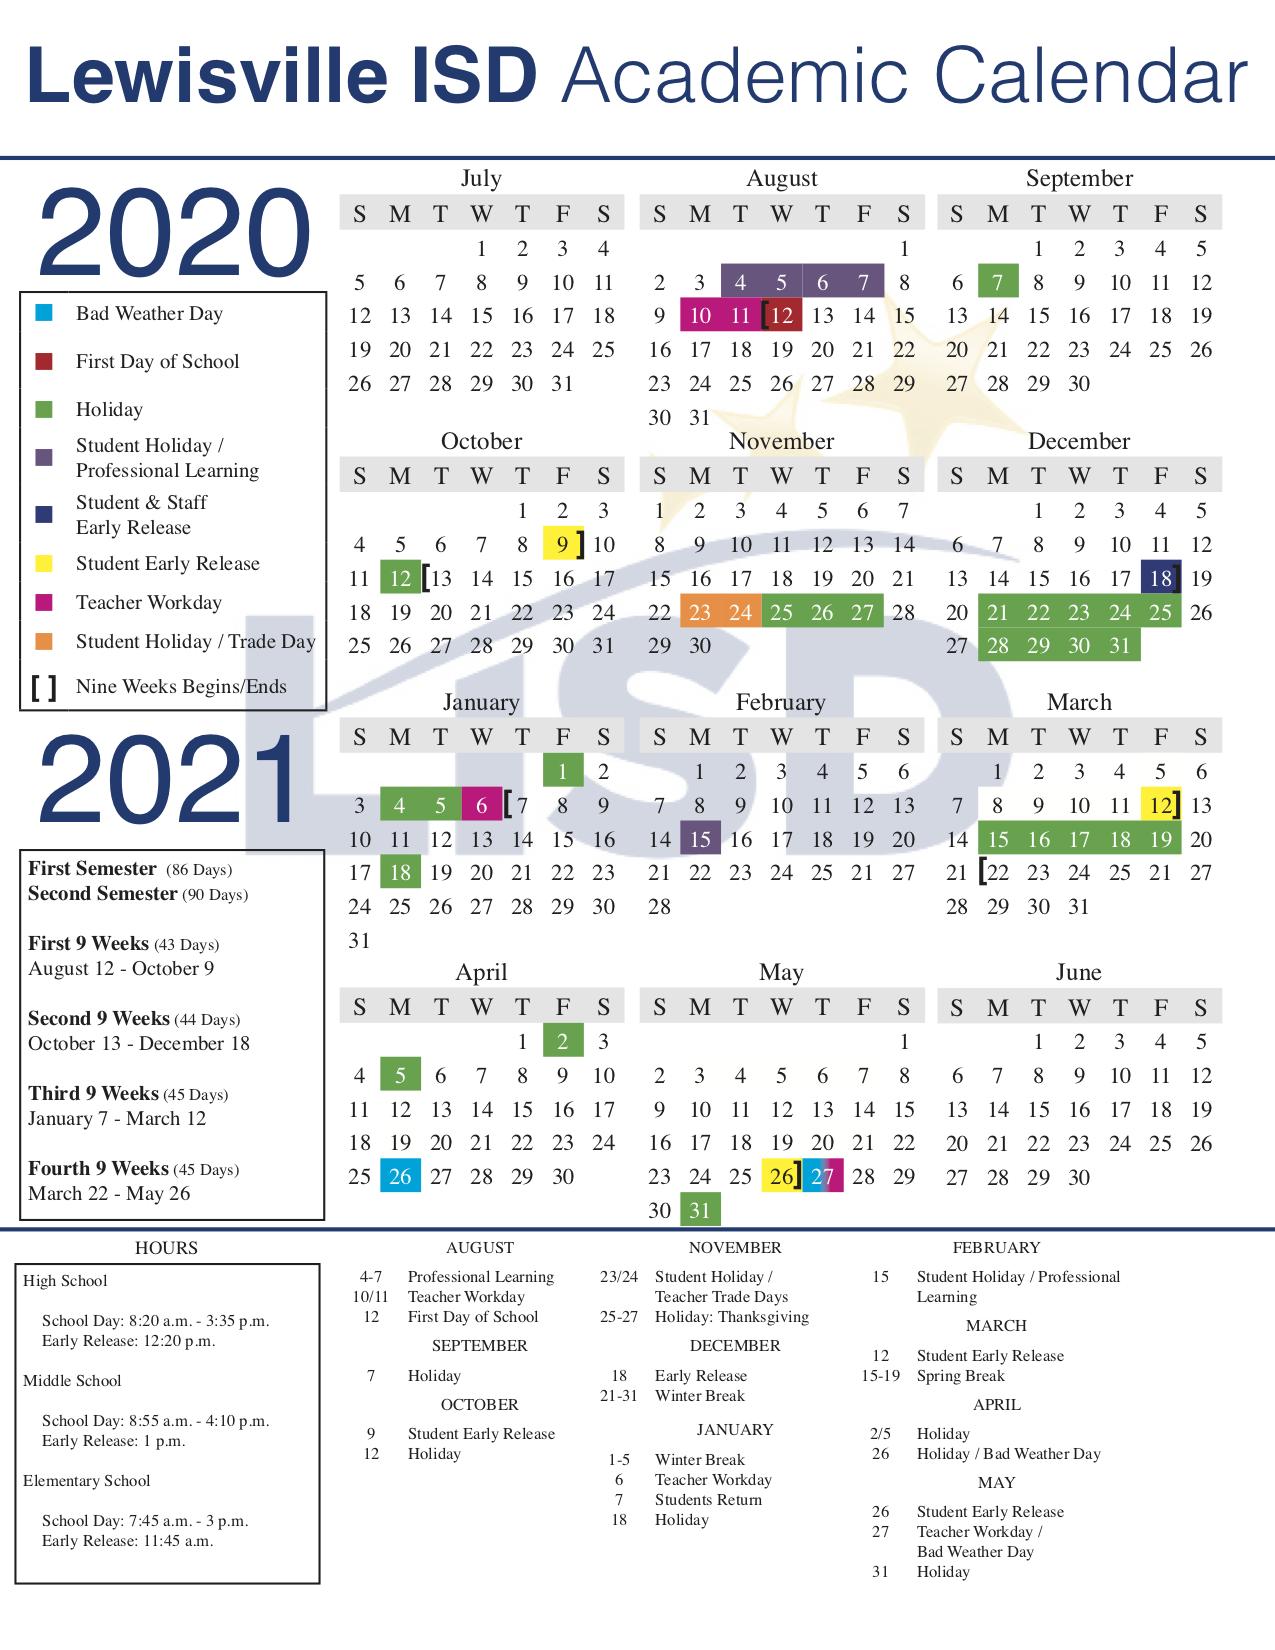 Lisd Approves 2020-21 Academic Calendar intended for Francis Lewis High School 2021 Calendar